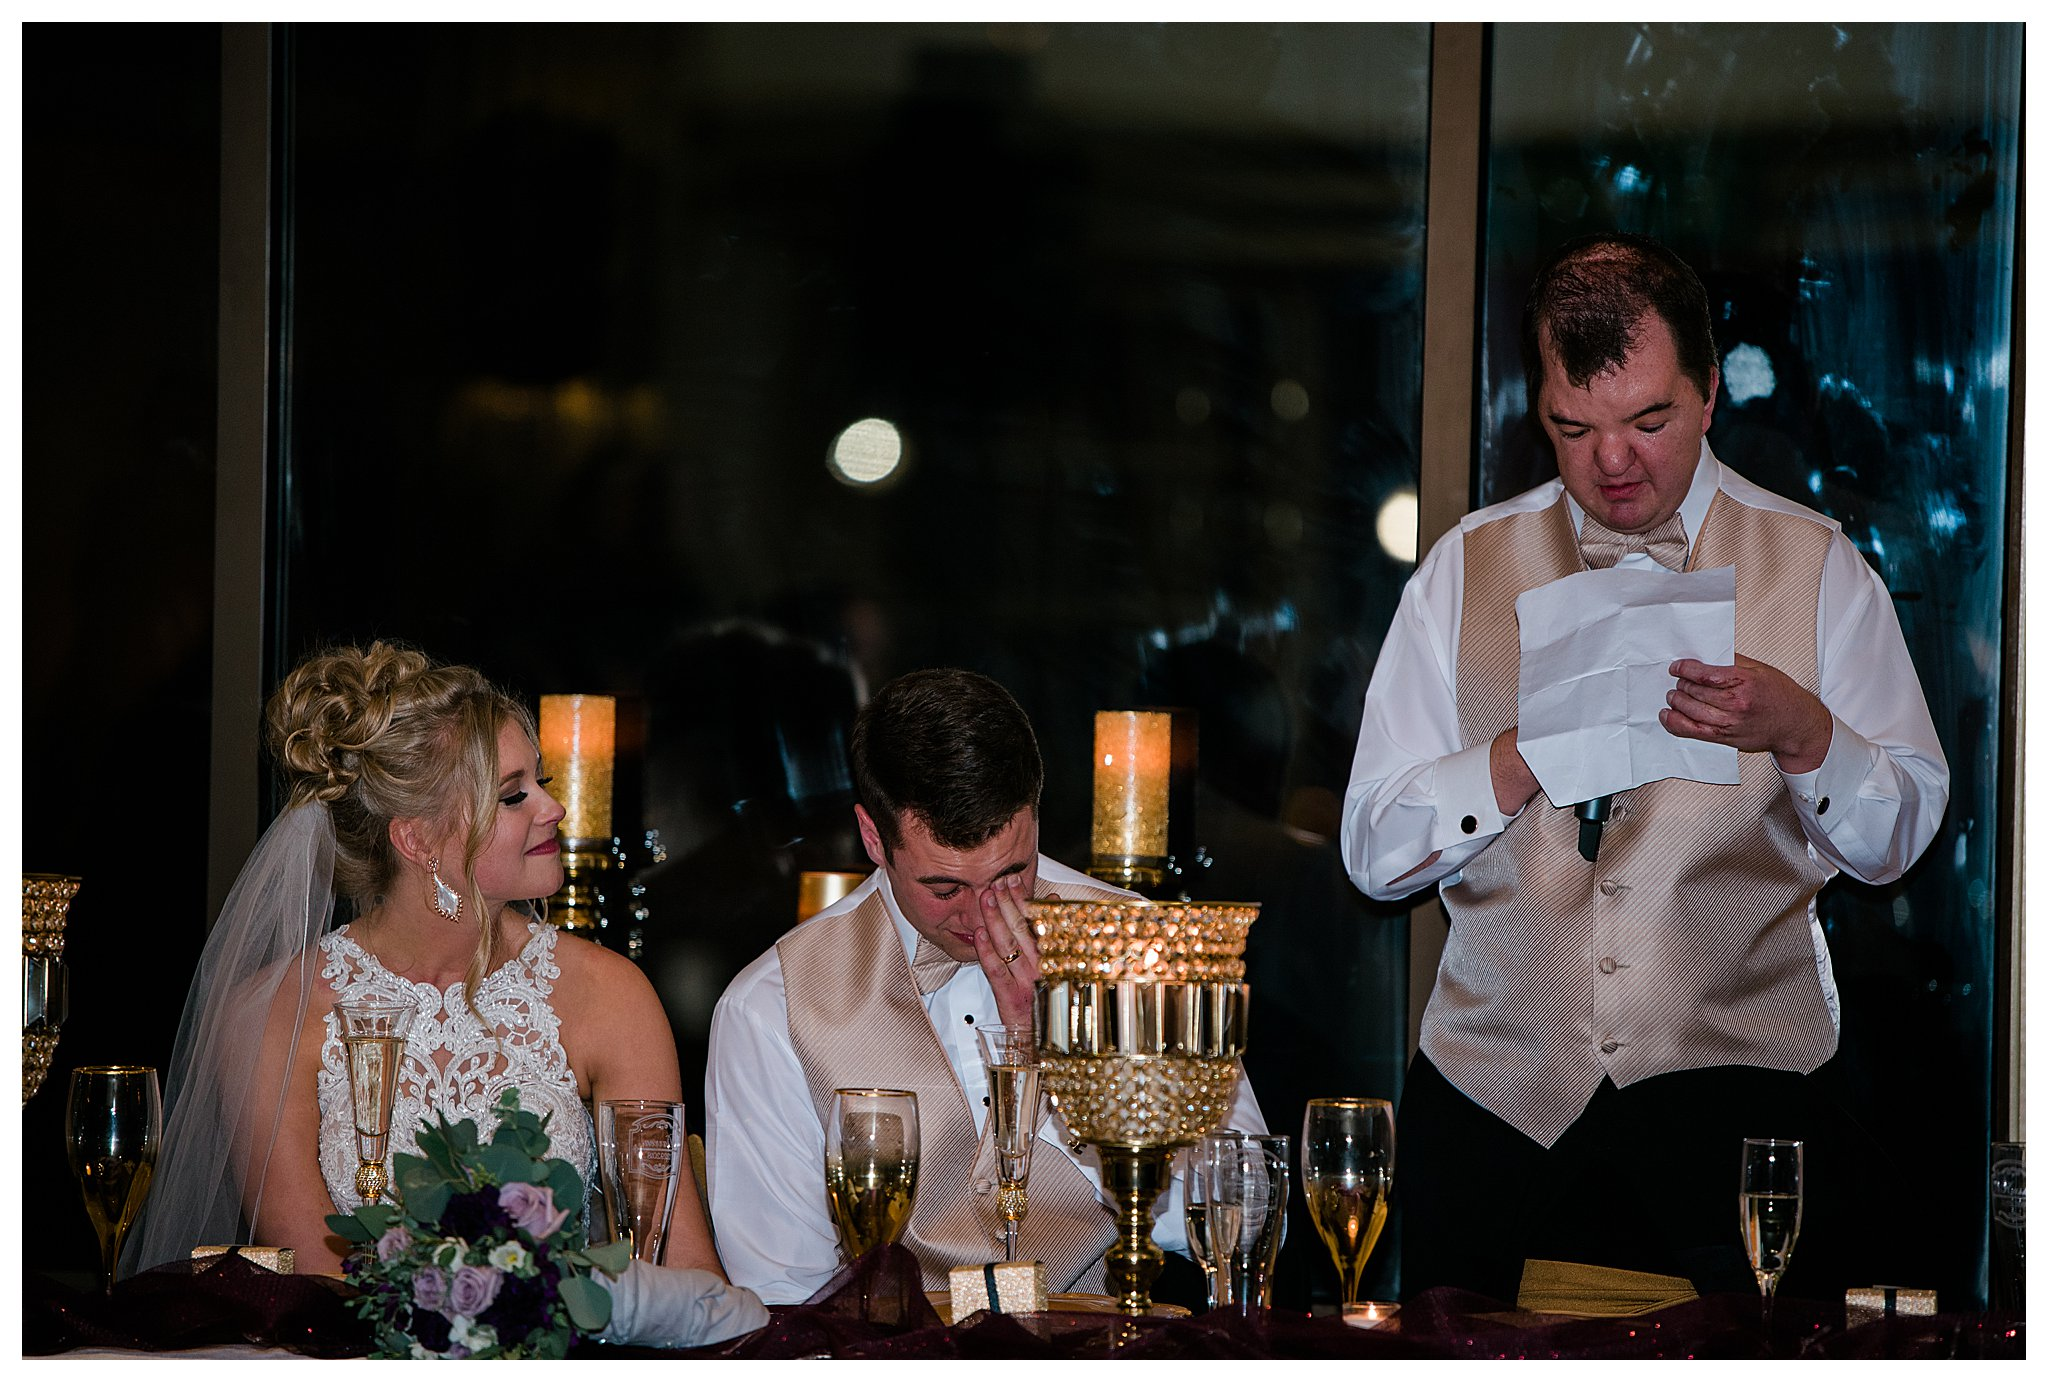 Boise Wedding Photographer, Idaho Wedding Photographer, candlelit wedding, plum and gold wedding colors, winter wedding, reception, fun dancing, speech, lace wedding dress, wedding updo, sentimental wedding ideas, documentary wedding photographer, wedding photography, large group wedding, church wedding